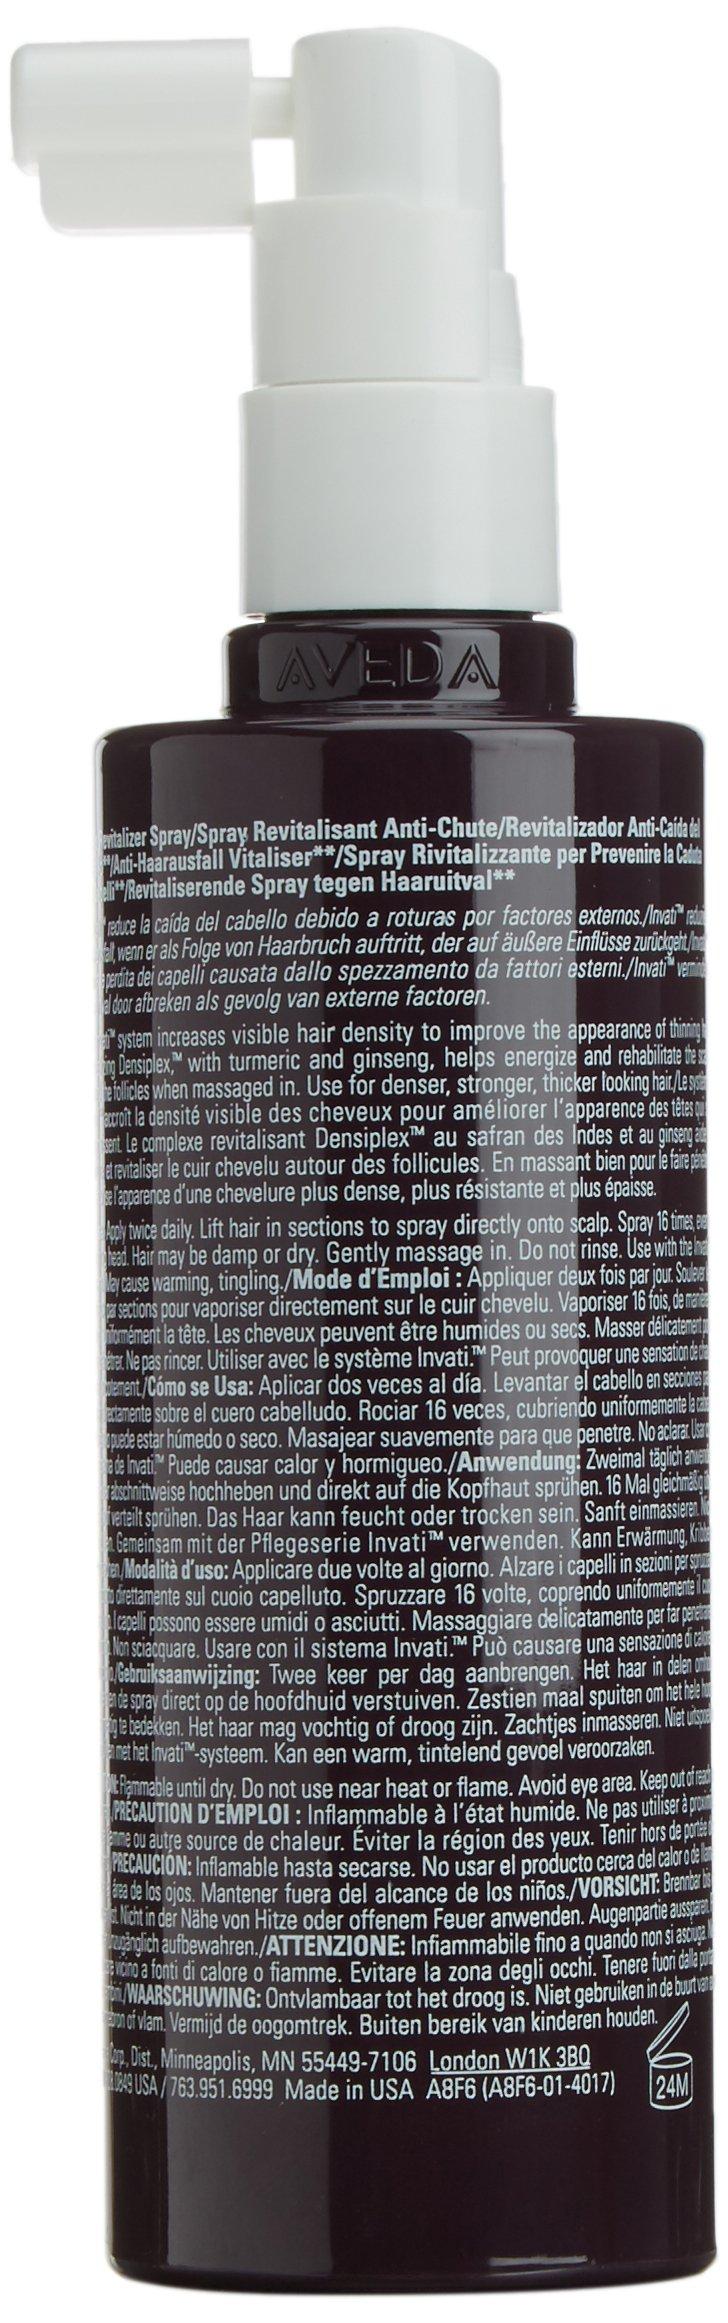 Aveda Invati Scalp Revitalizer, 5.1 Ounce by AVEDA (Image #2)